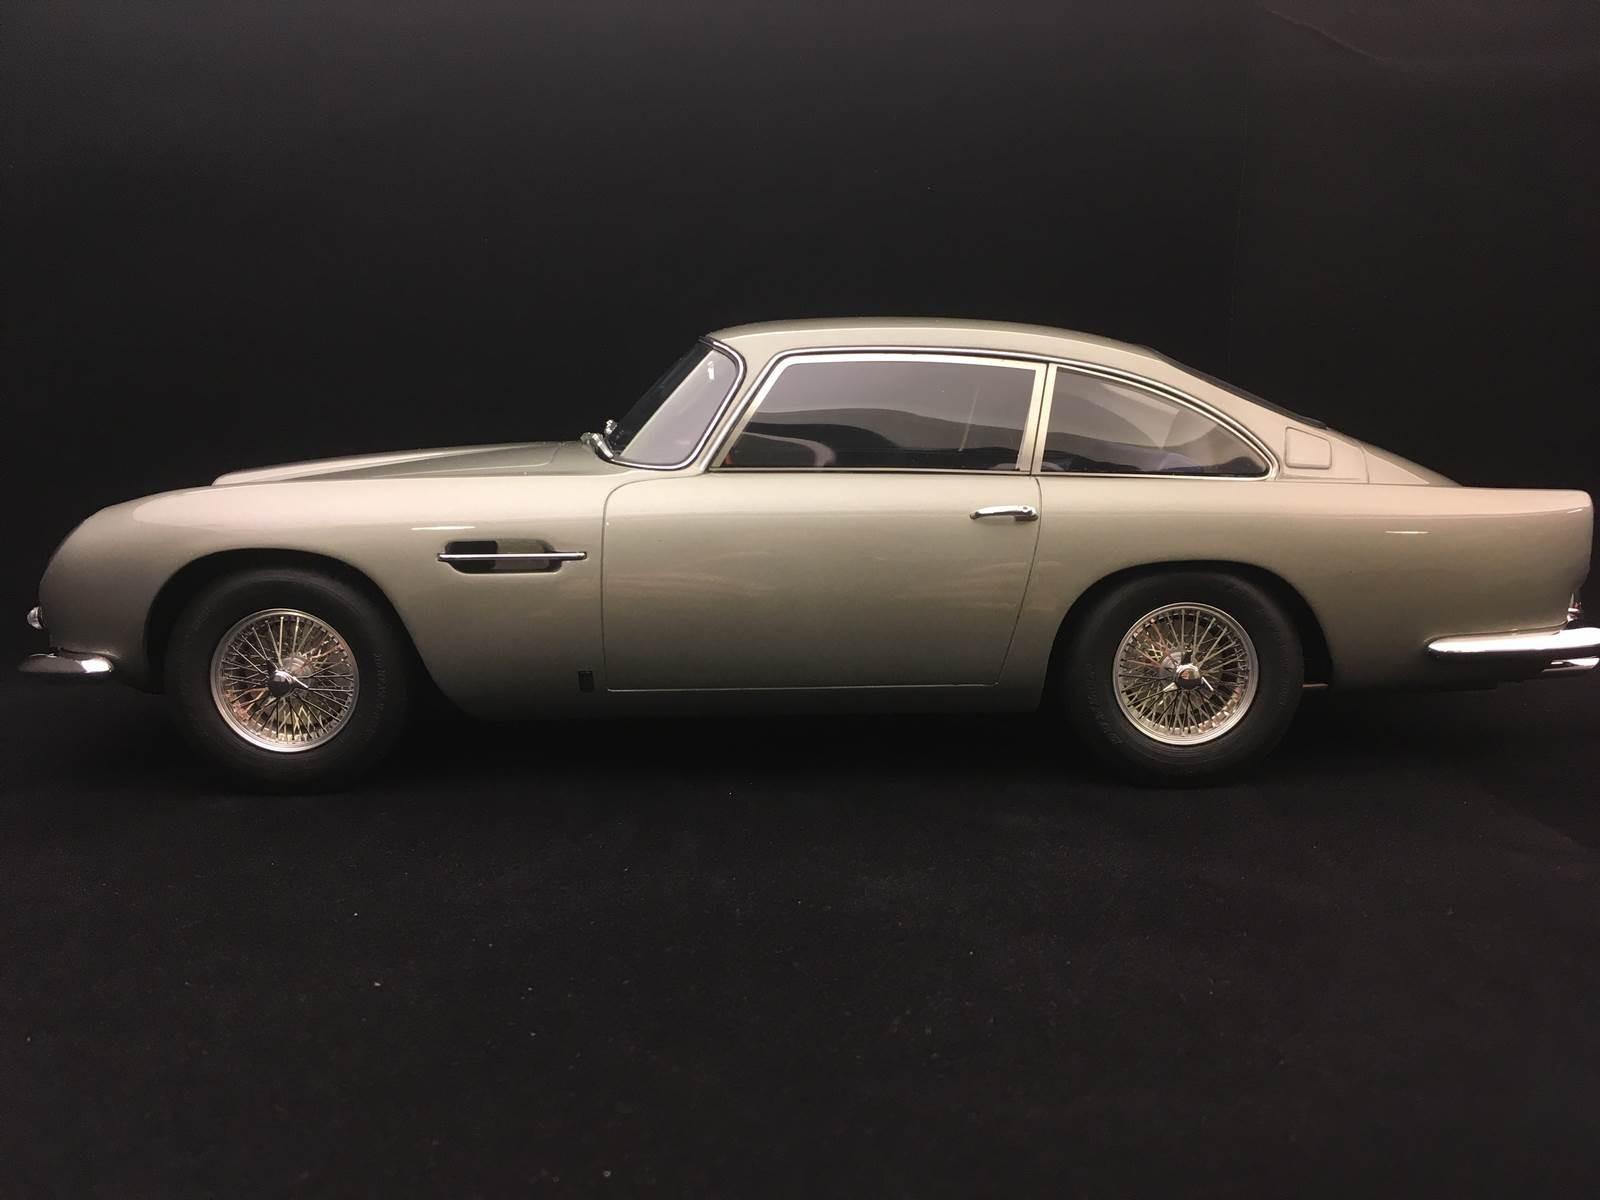 Aston Martin Db5 1964 Silber 1 12 Gt Spirit Gt765 Selection Rs